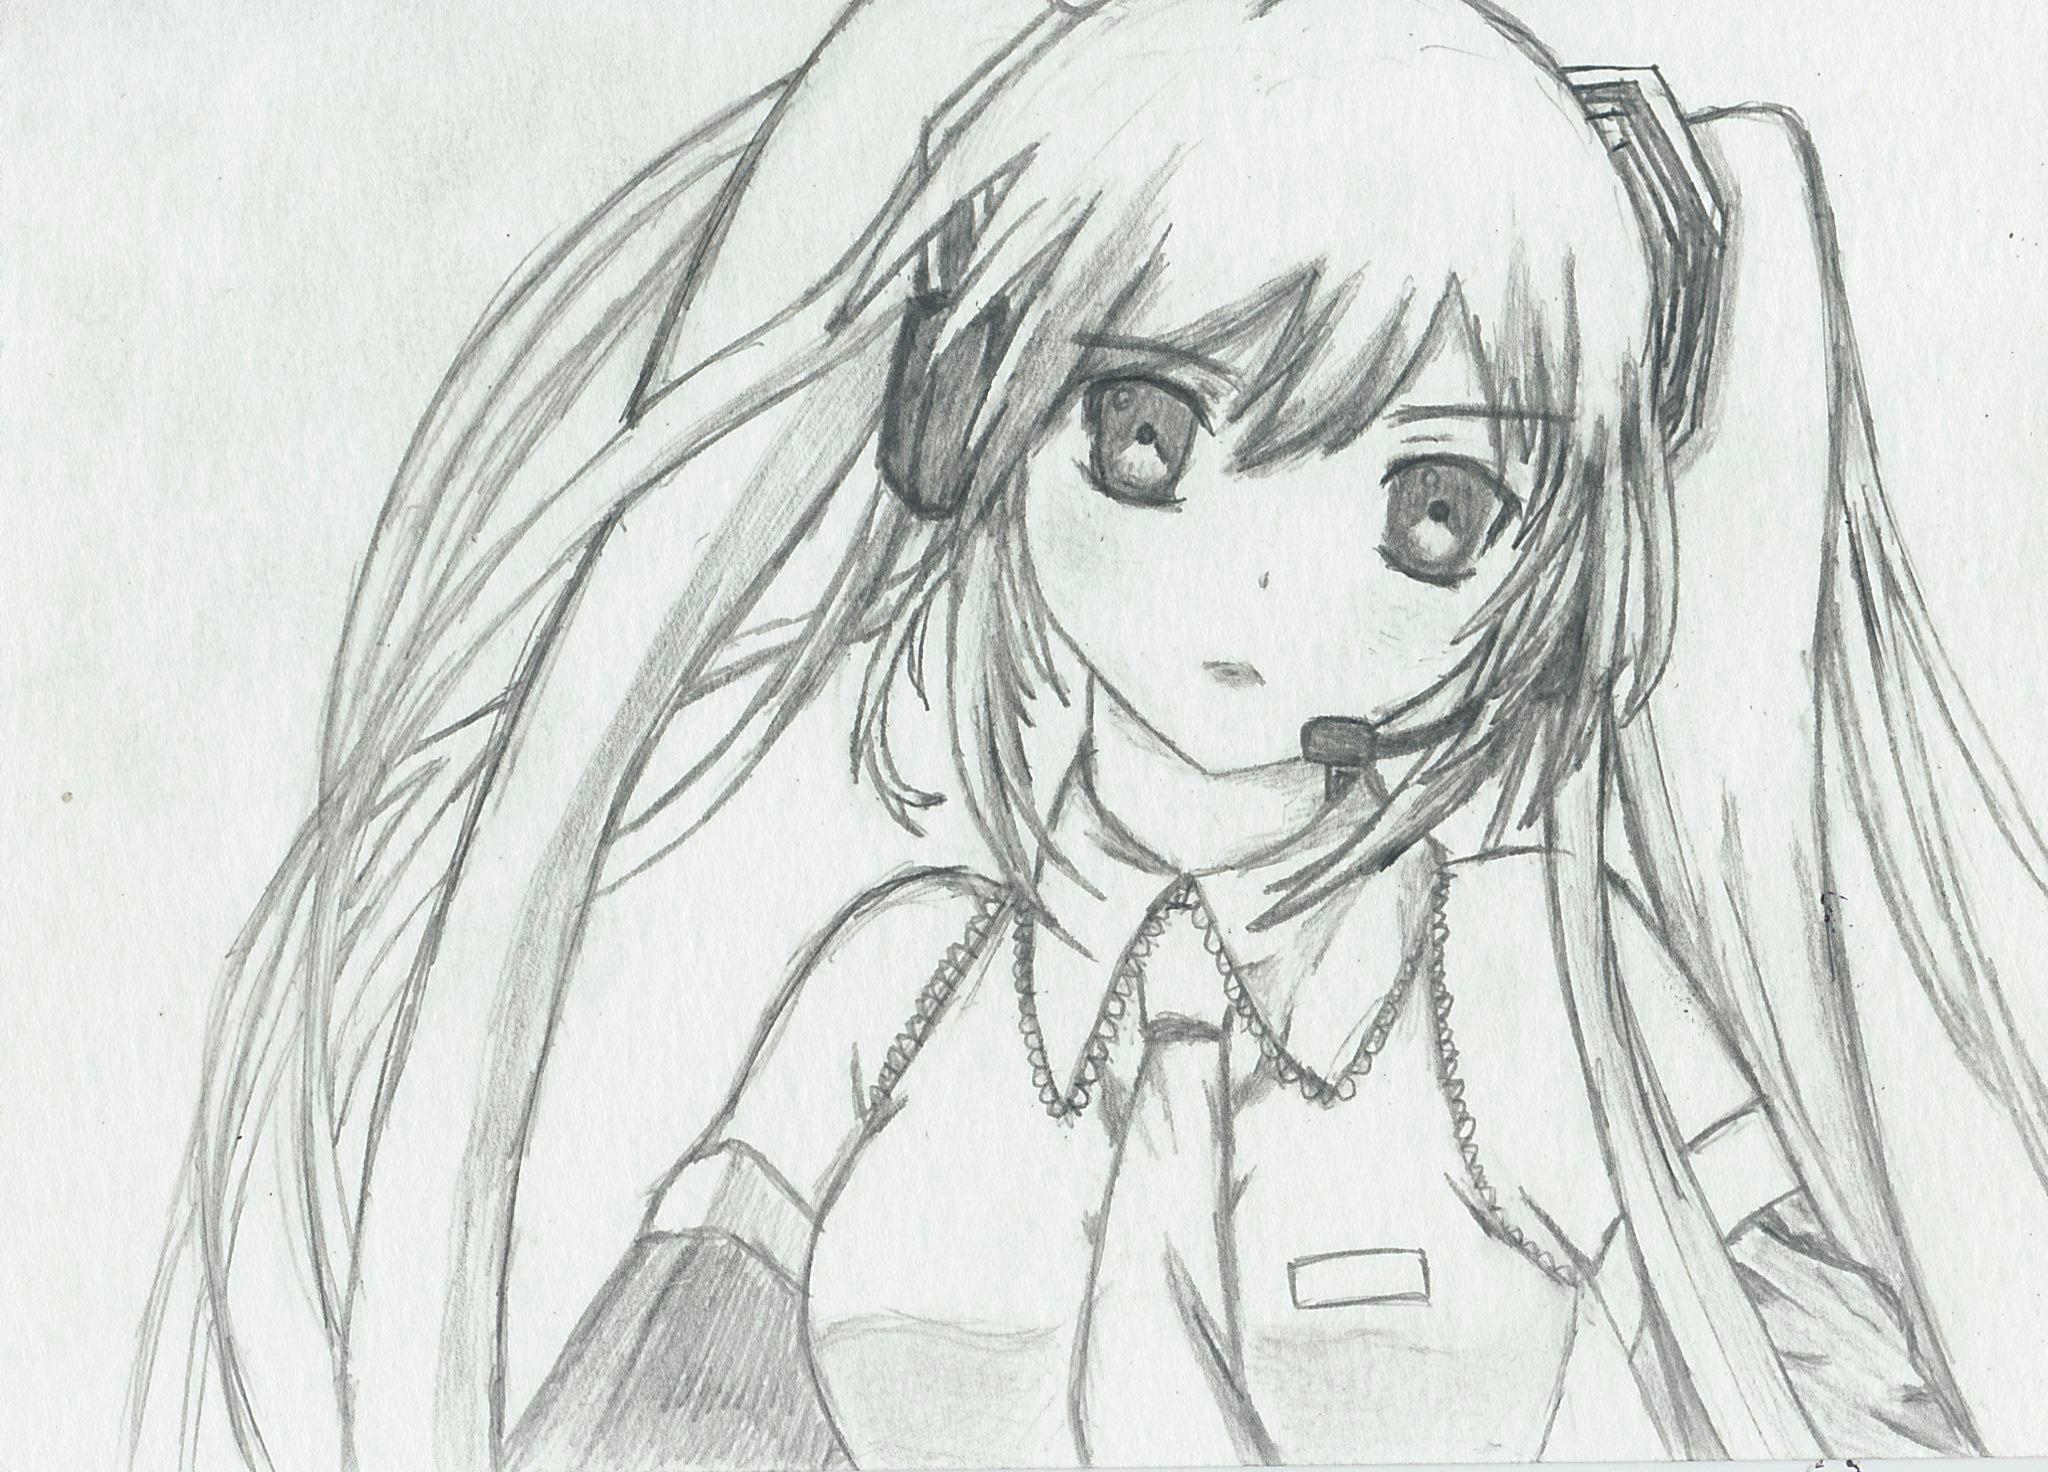 Hatsune Miku Sketch by Tyronesc on DeviantArt Hatsune Miku Drawing Markcrilley